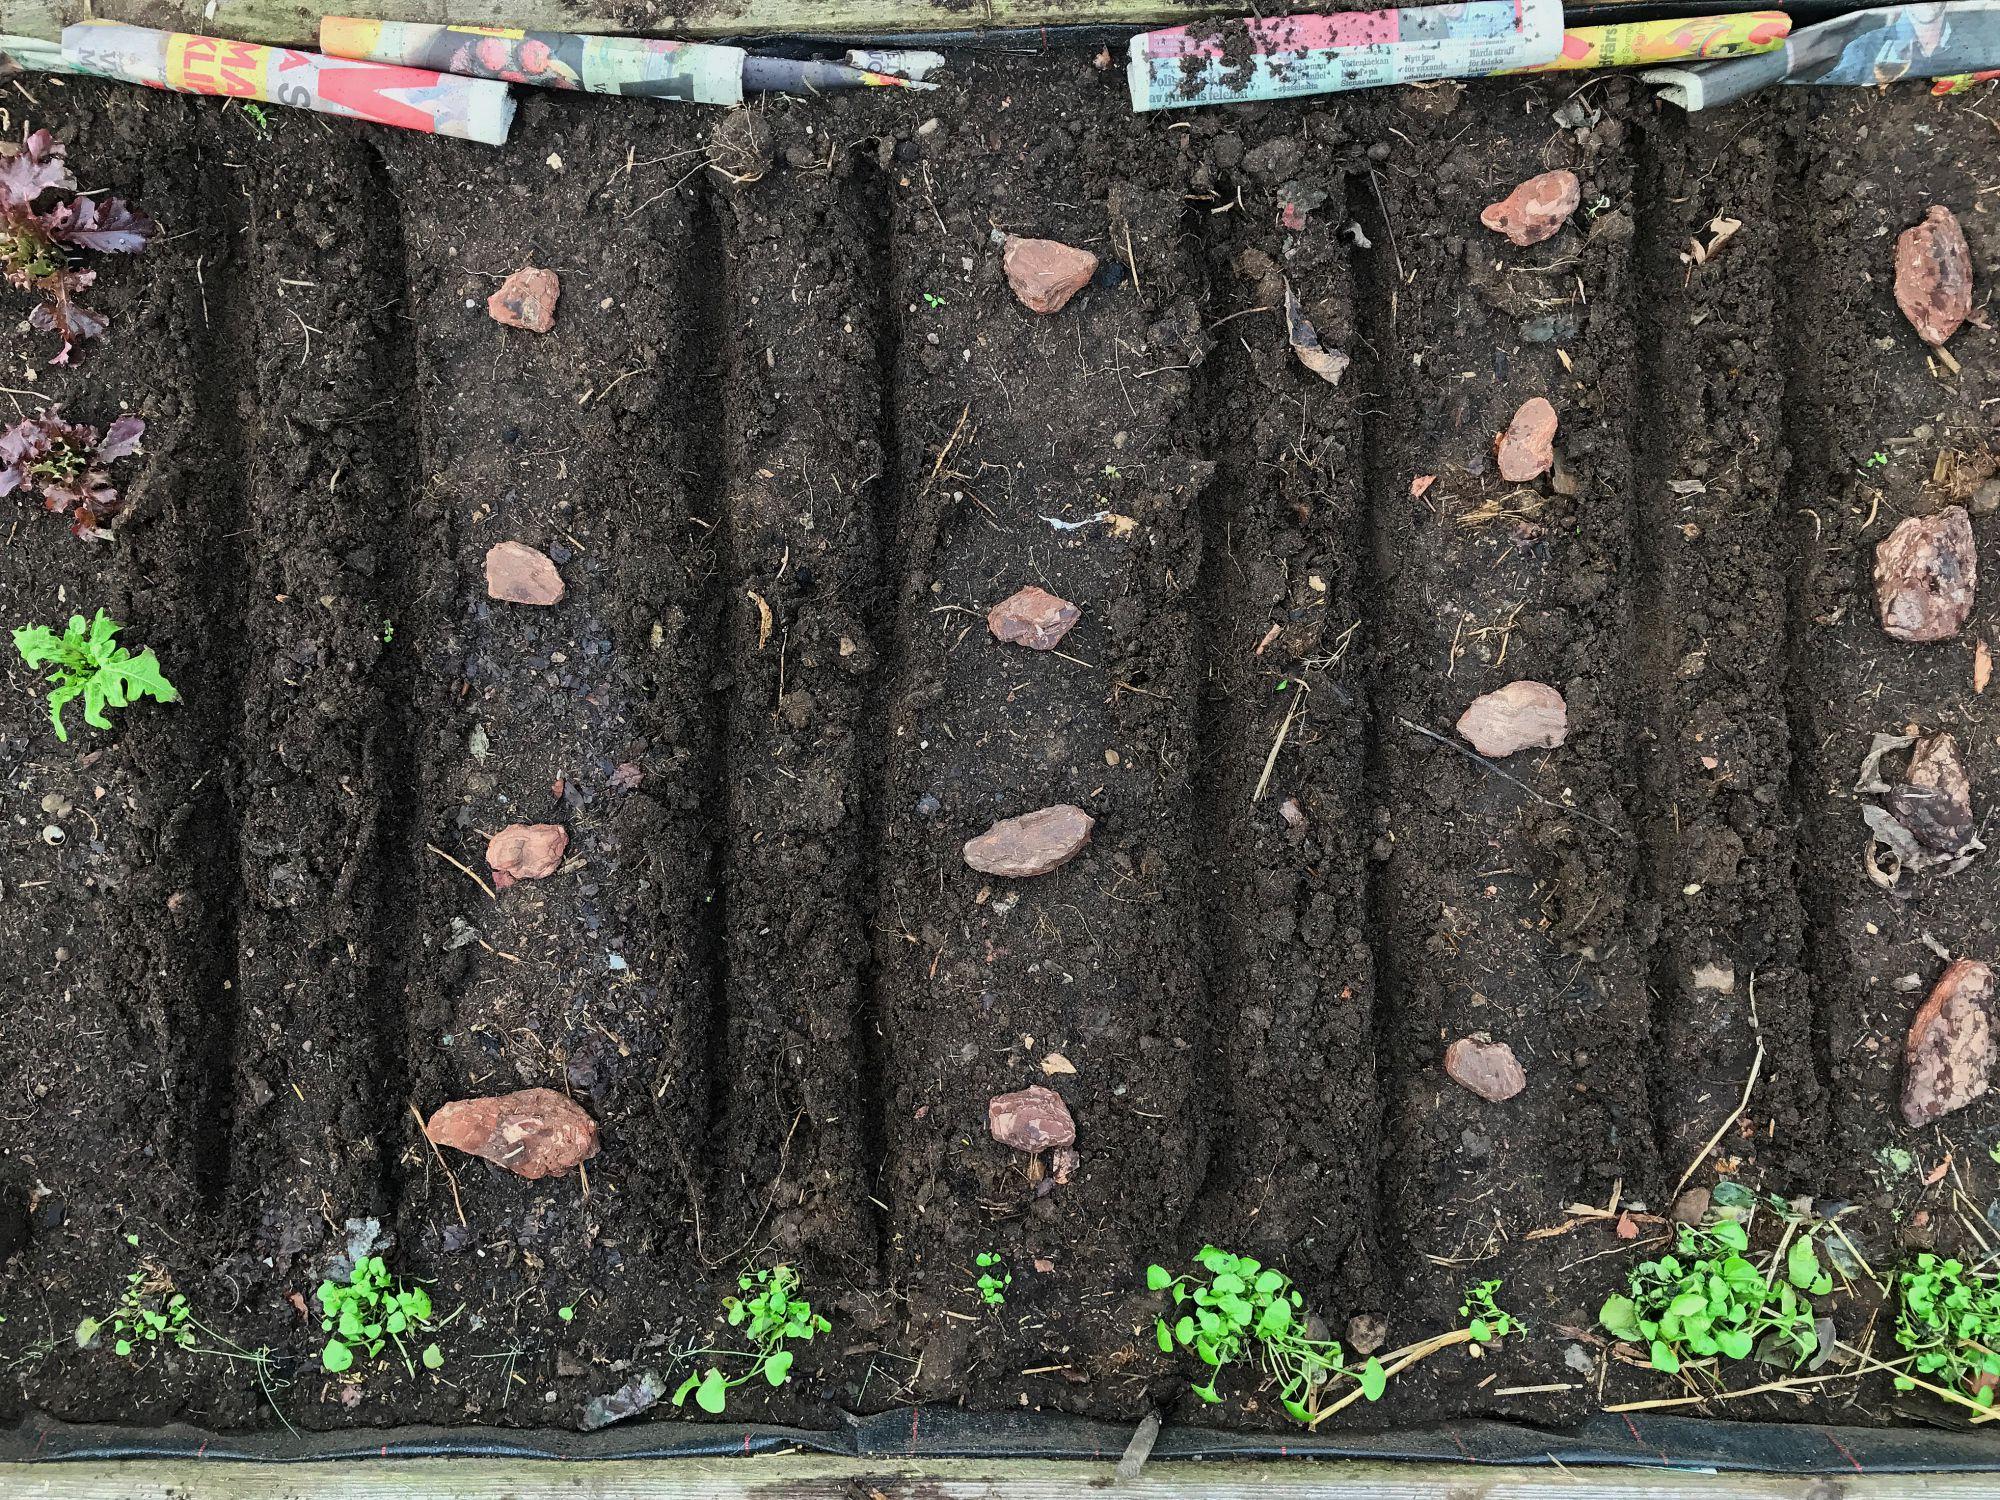 Såfåror i jord i tunnelväxthuset.